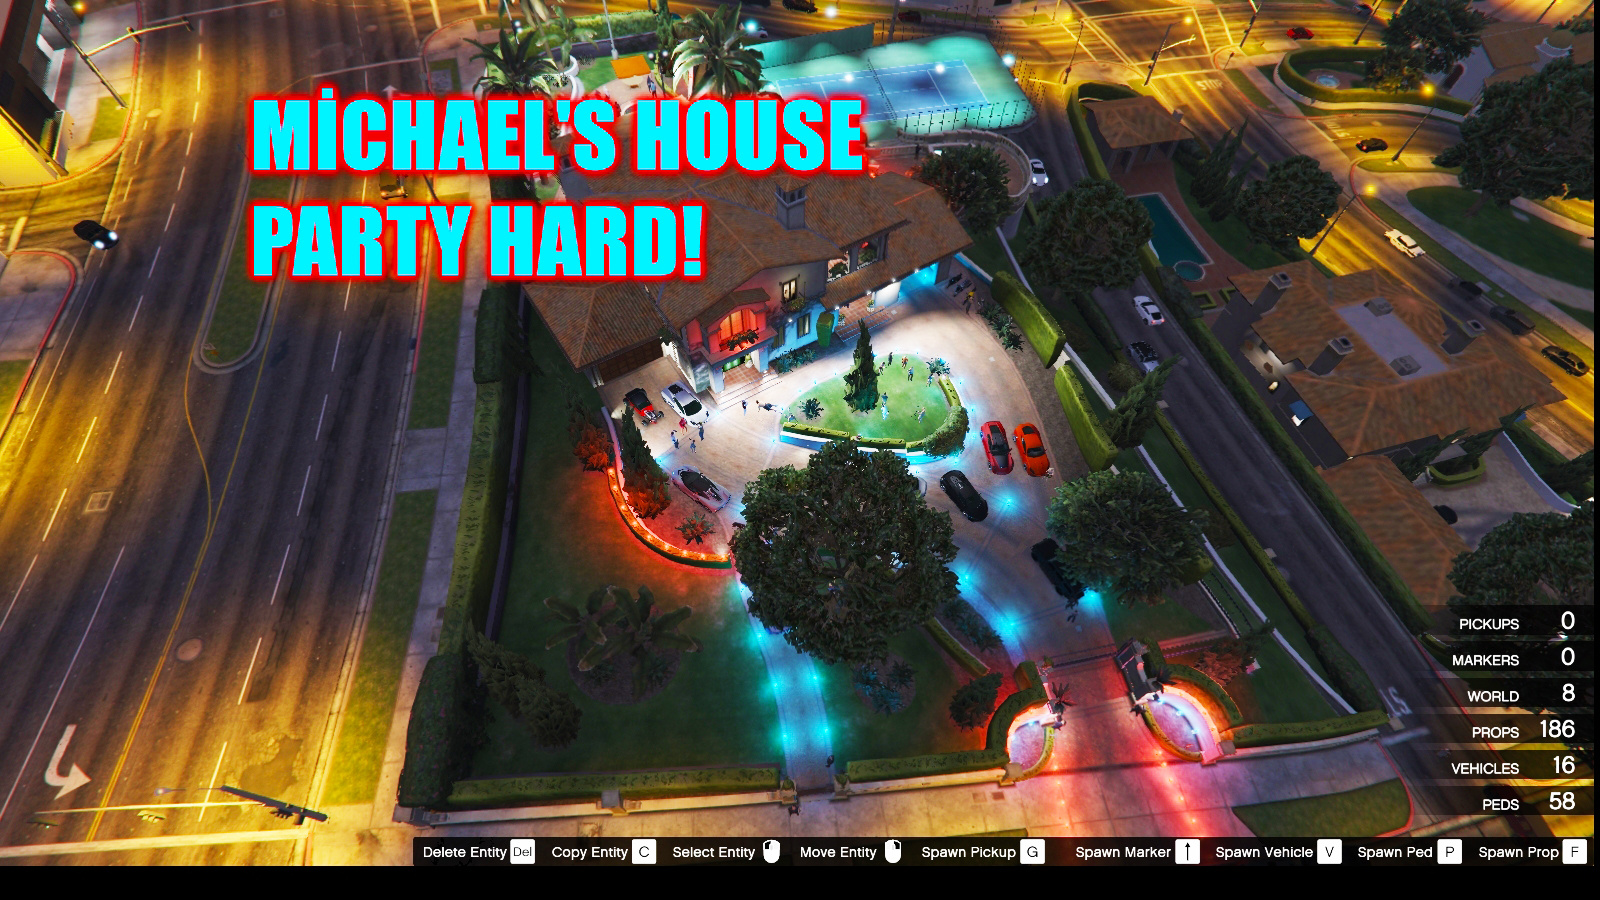 Michaels House Party Hard Gta5 Modscom